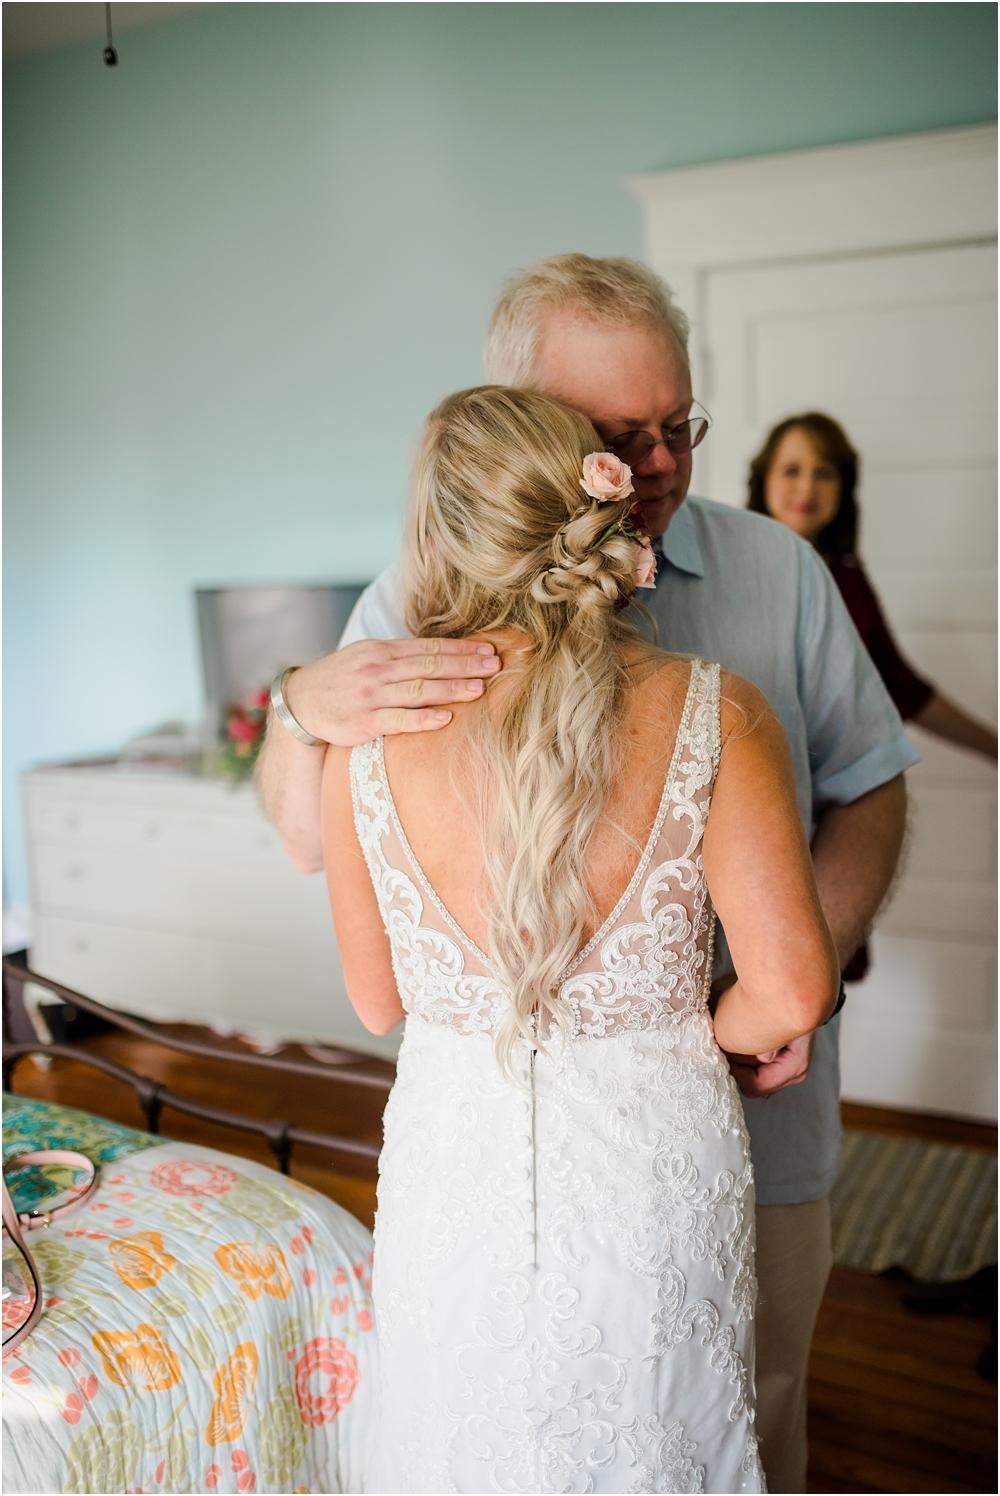 mcglothlin-wedding-kiersten-stevenson-photography-30a-panama-city-beach-dothan-tallahassee-(41-of-145).jpg